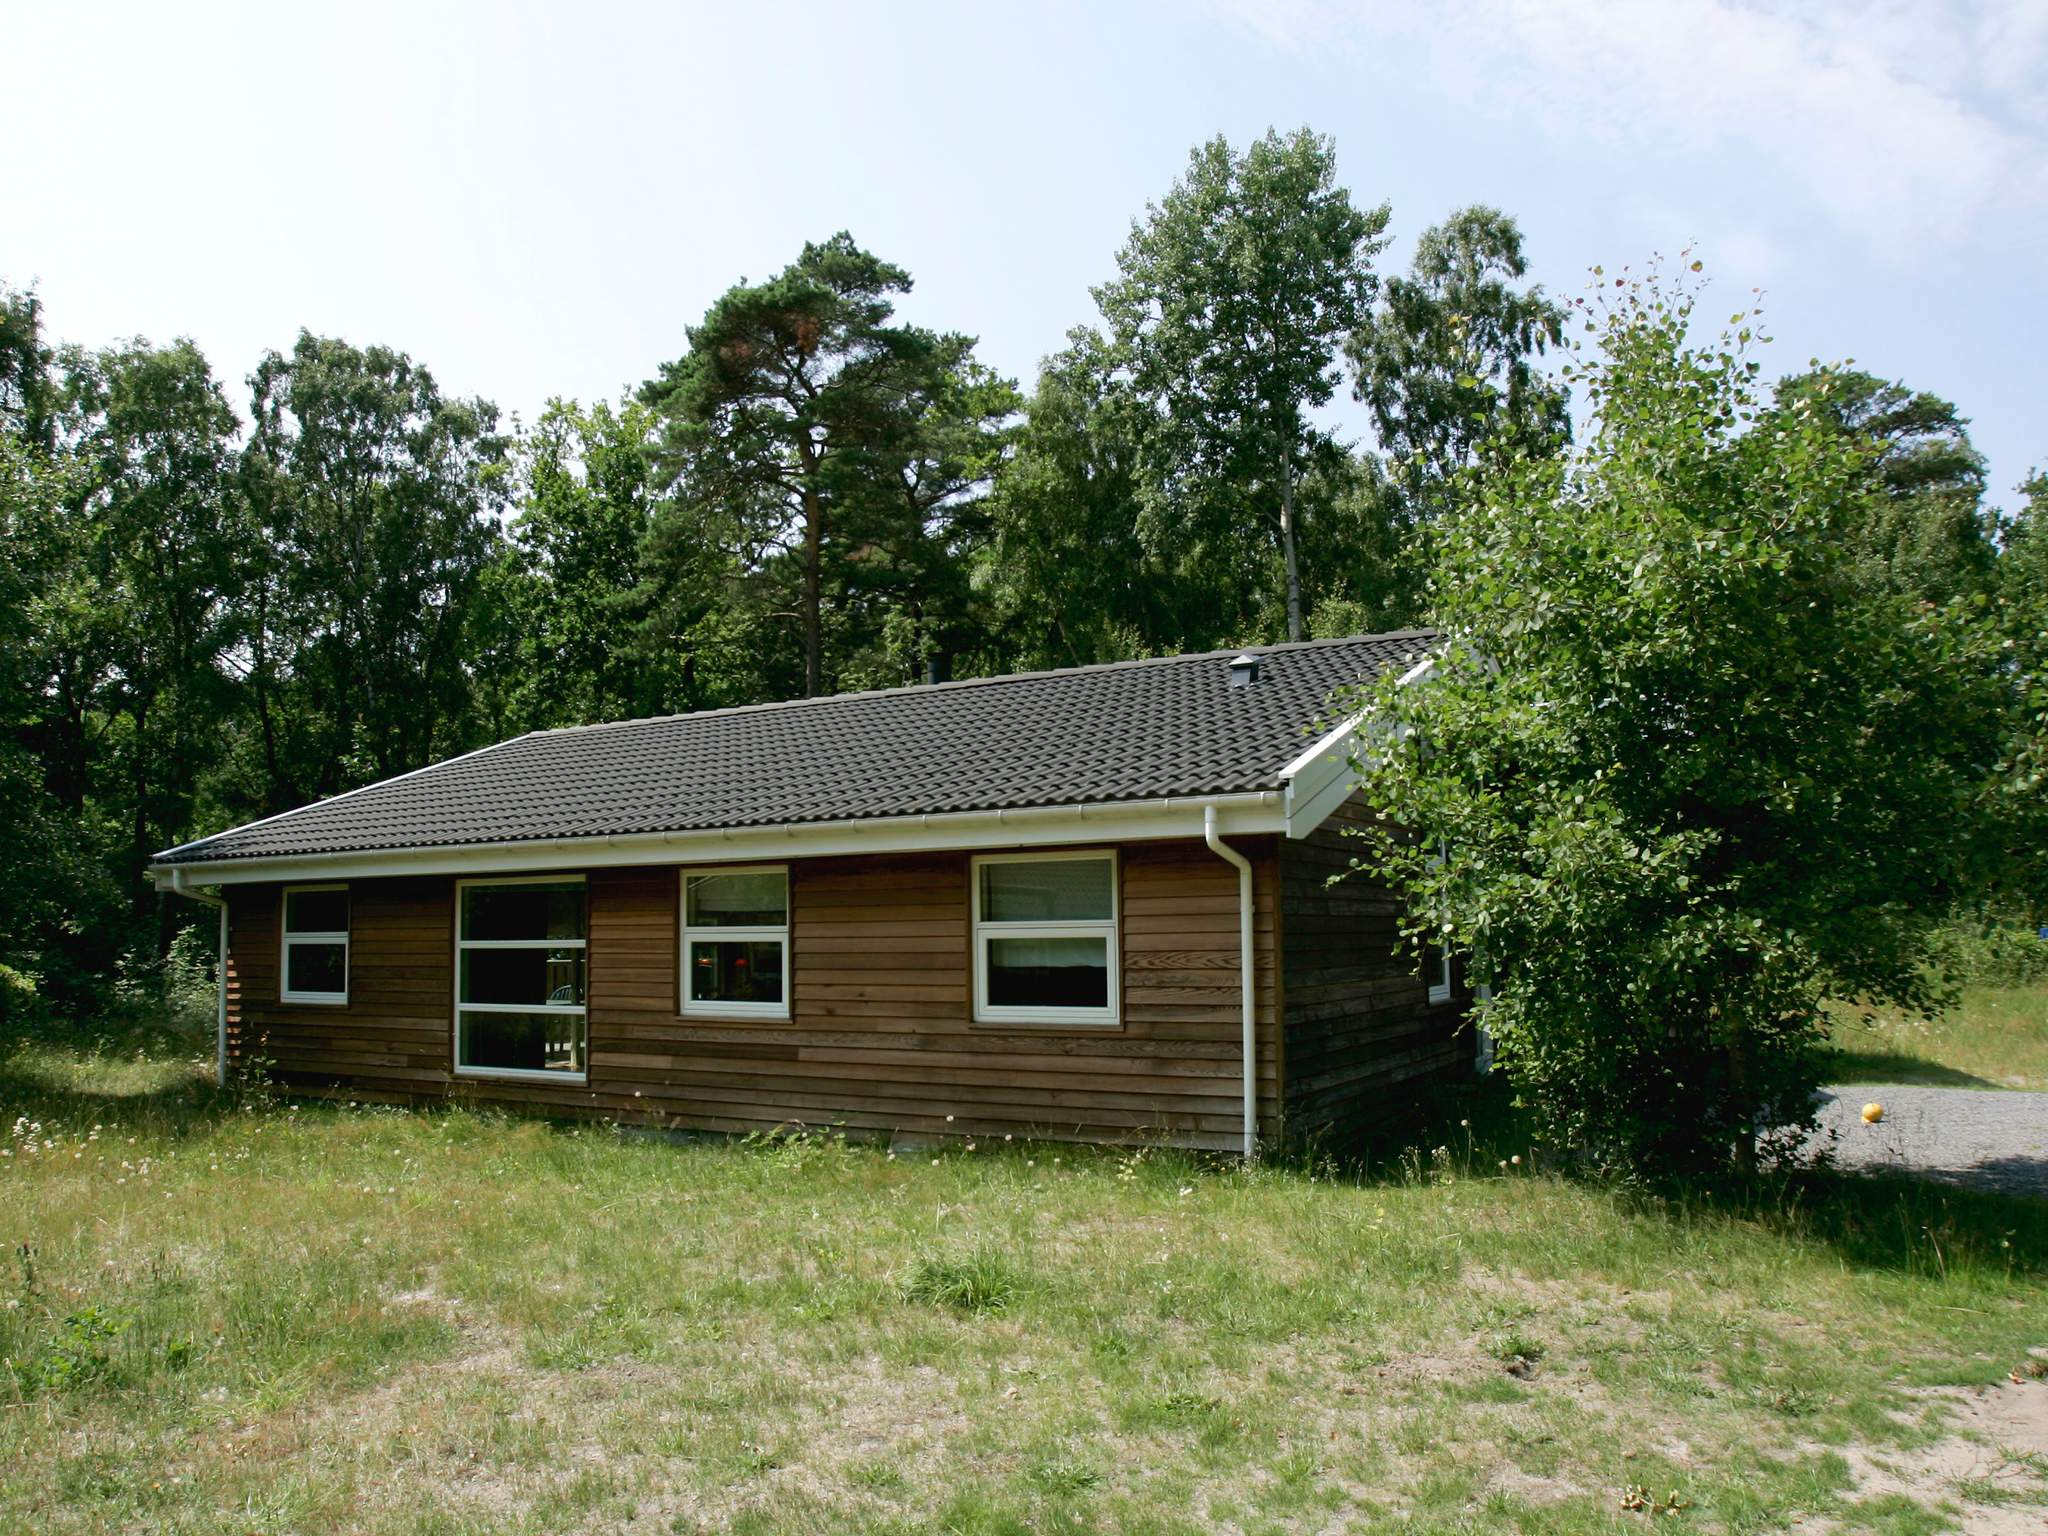 Ferienhaus Hasle (83419), Hasle, , Bornholm, Dänemark, Bild 14